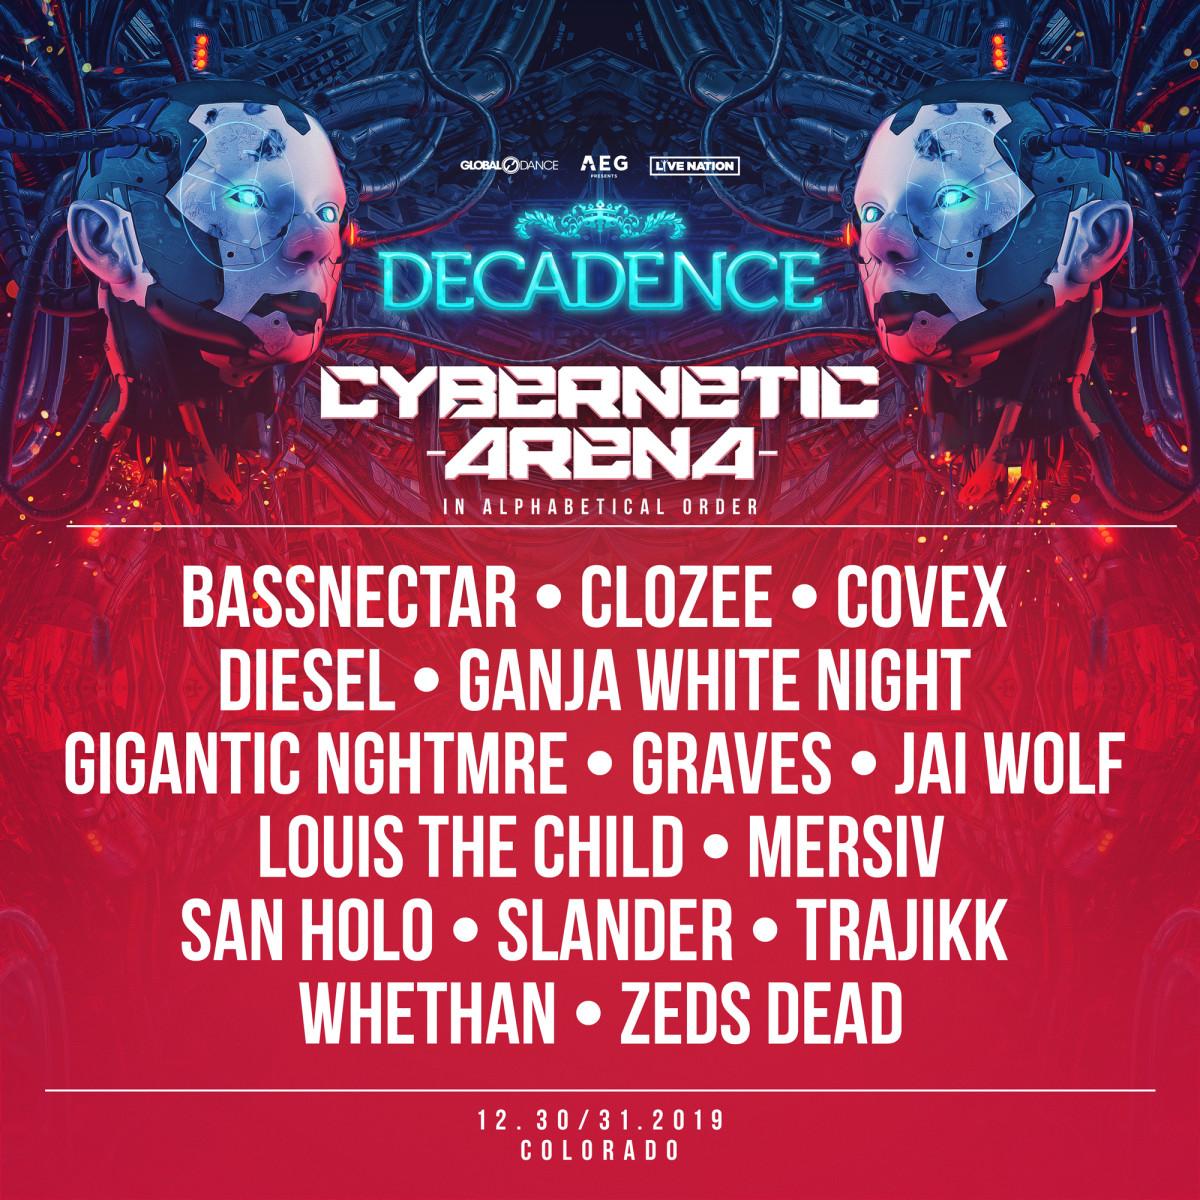 Decadence NYE 2019 Colorado Lineup Cybernetic Arena